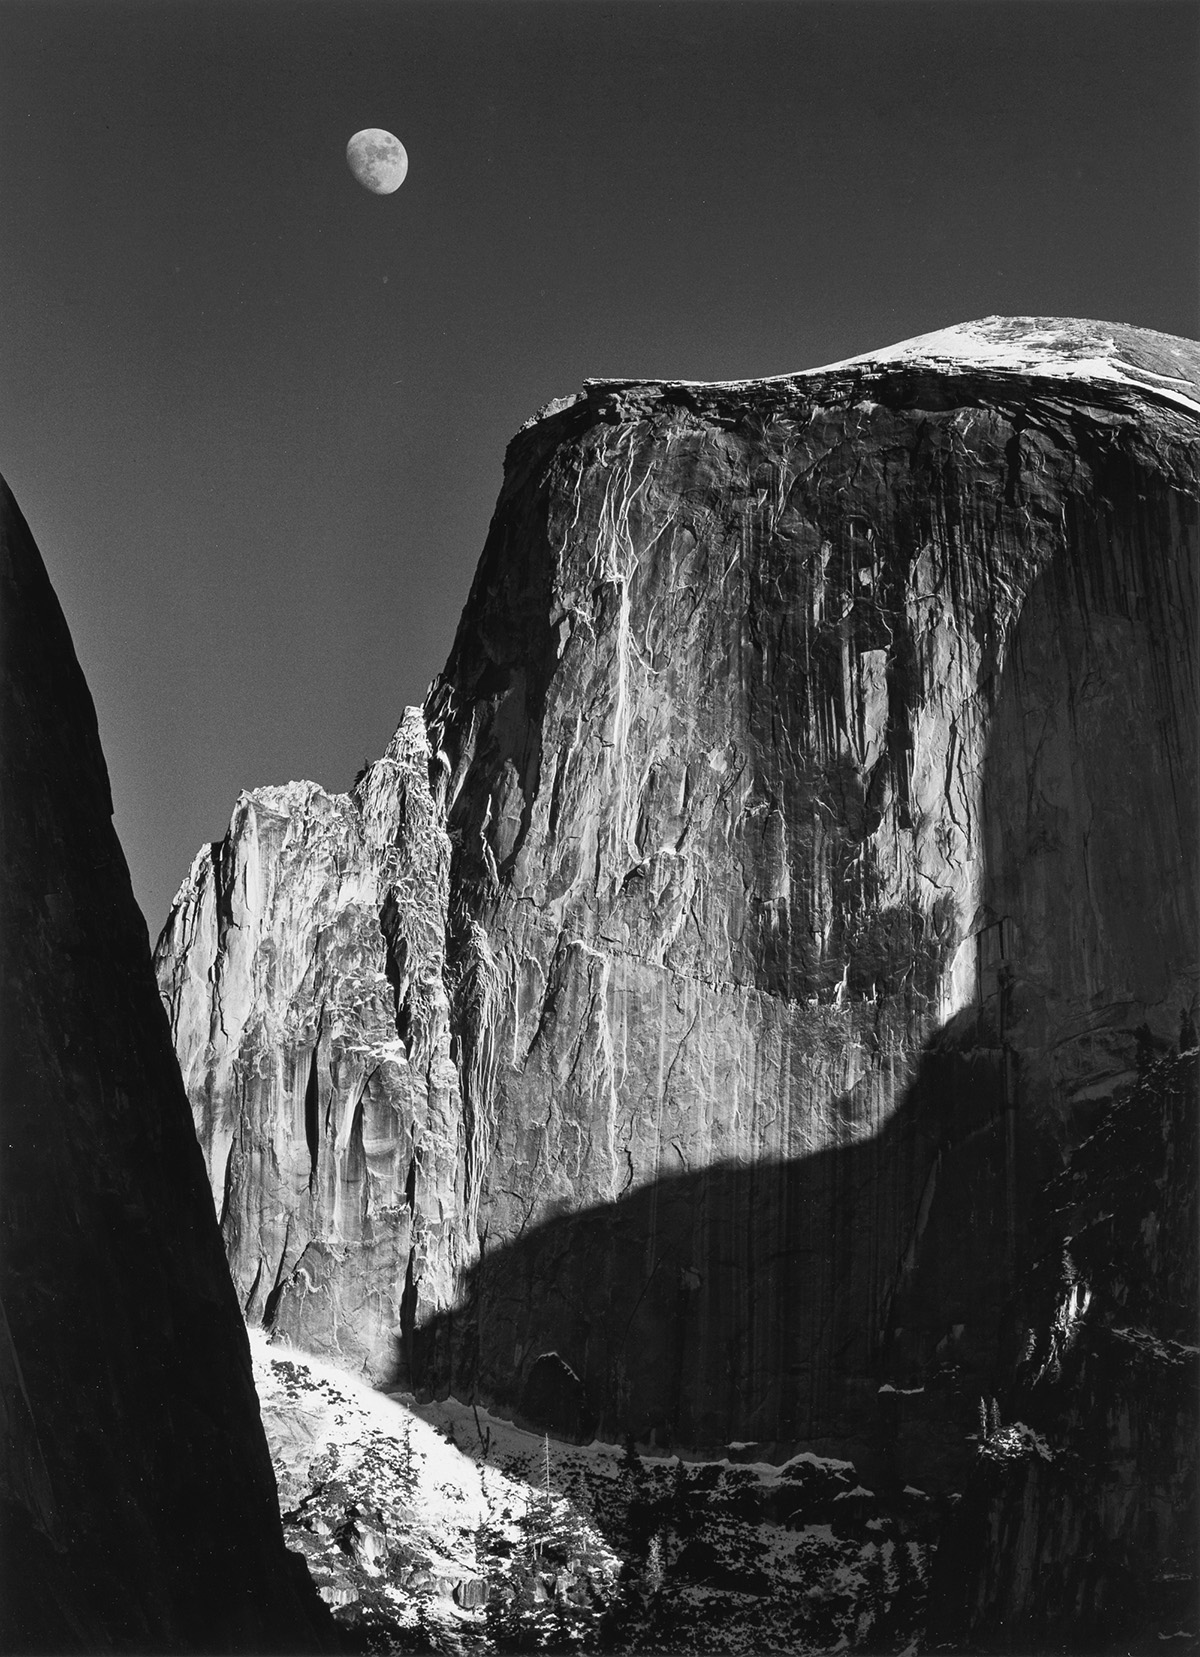 ANSEL-ADAMS-(1902-1984)-Moon-and-Half-Dome-Yosemite-National